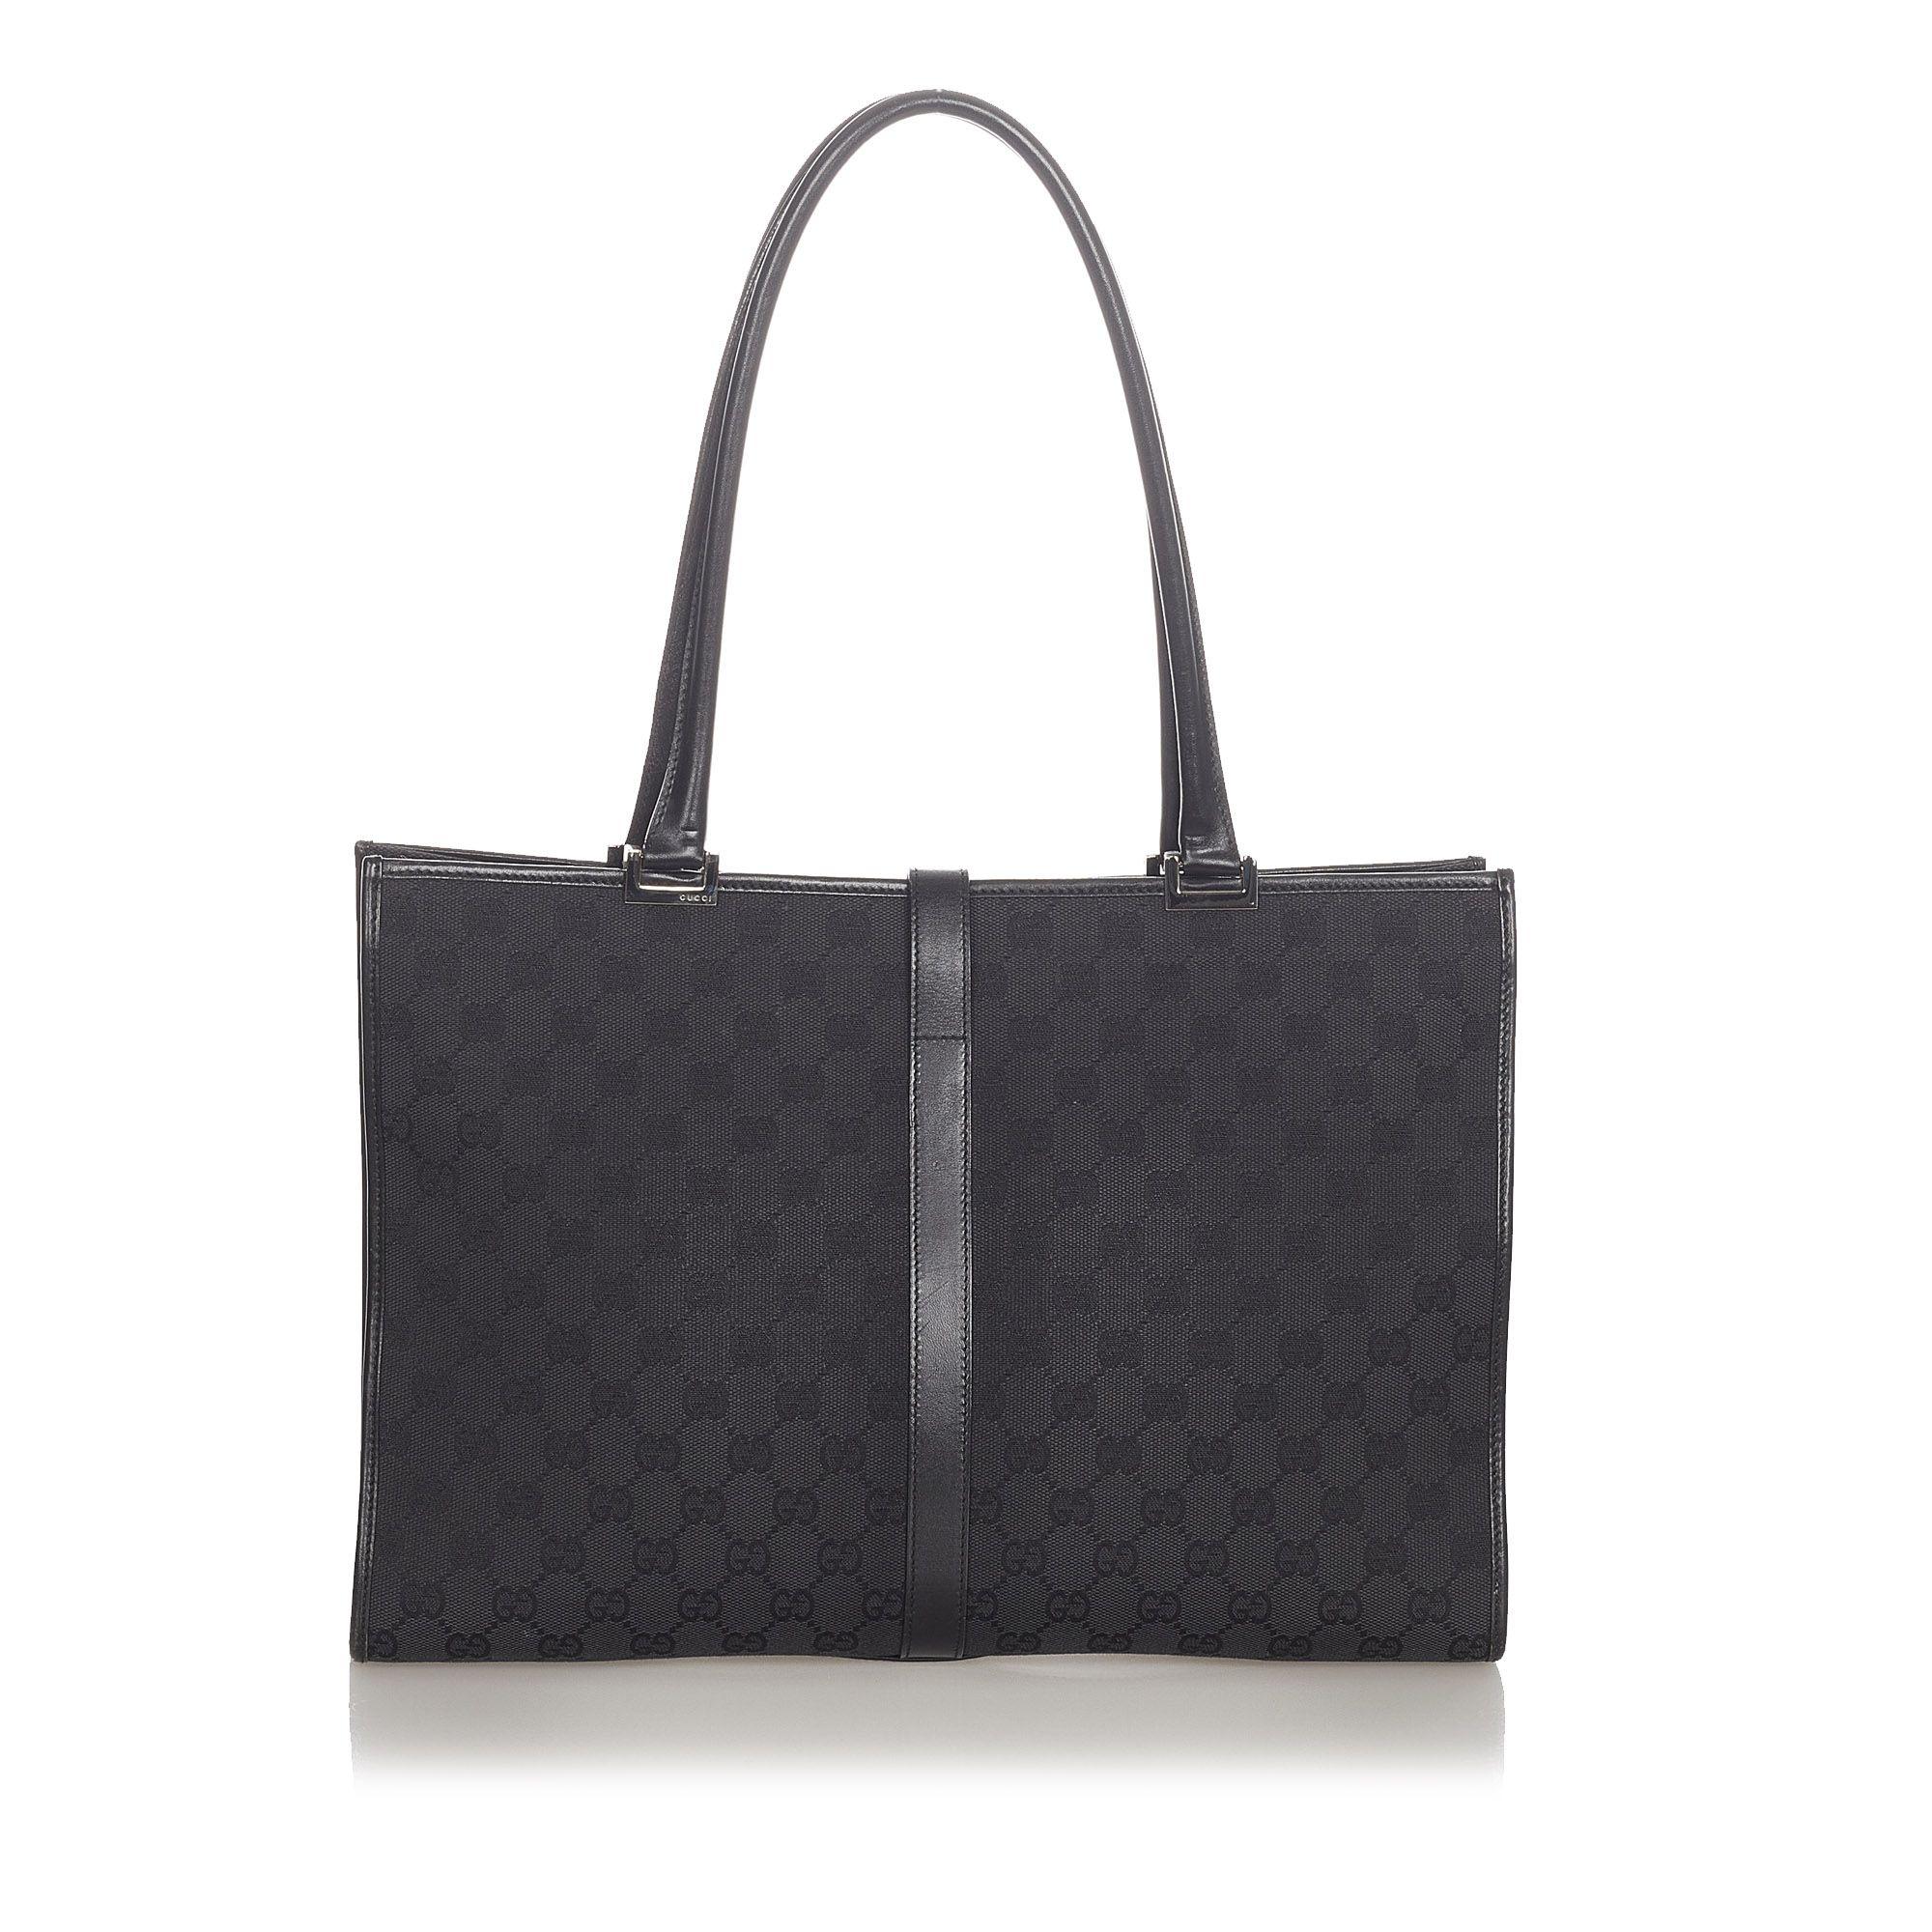 Vintage Gucci GG Canvas New Jackie Tote Bag Black